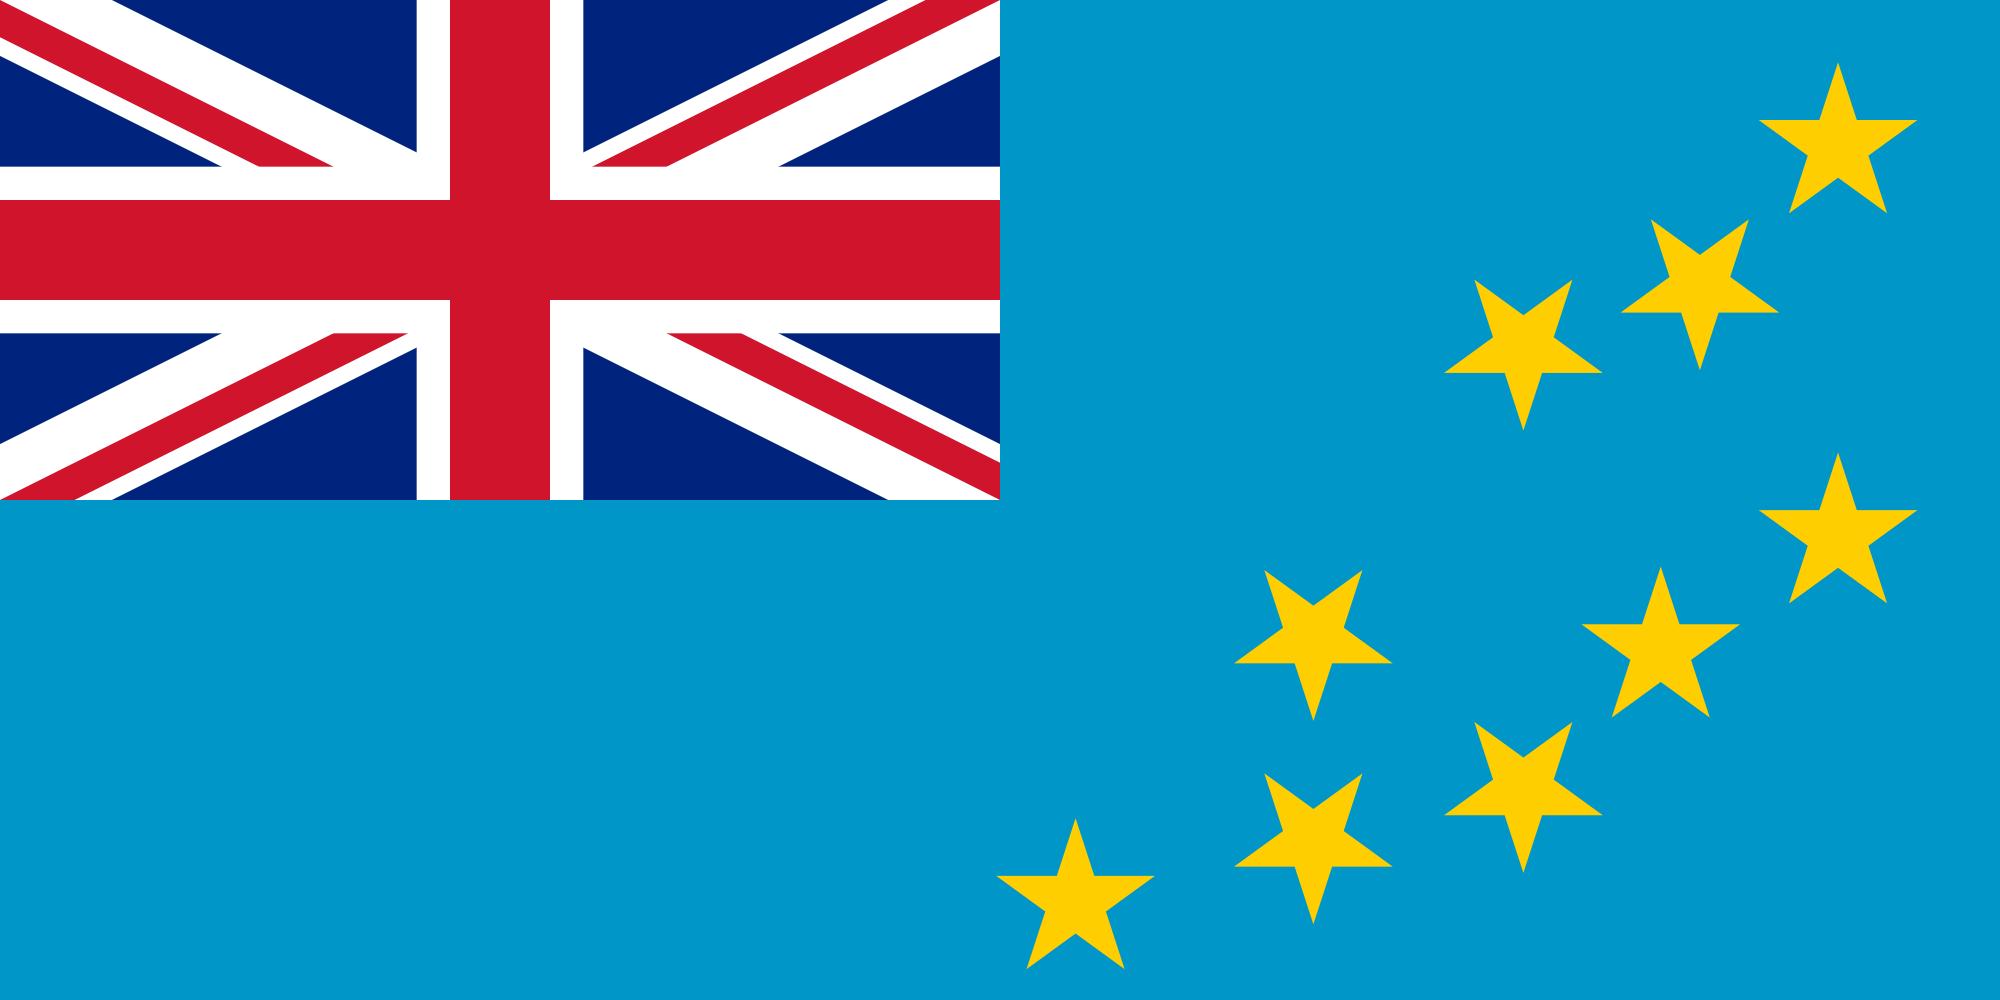 Wallpaper Of The Flag Of Tuvalu PaperPull 2000x1000